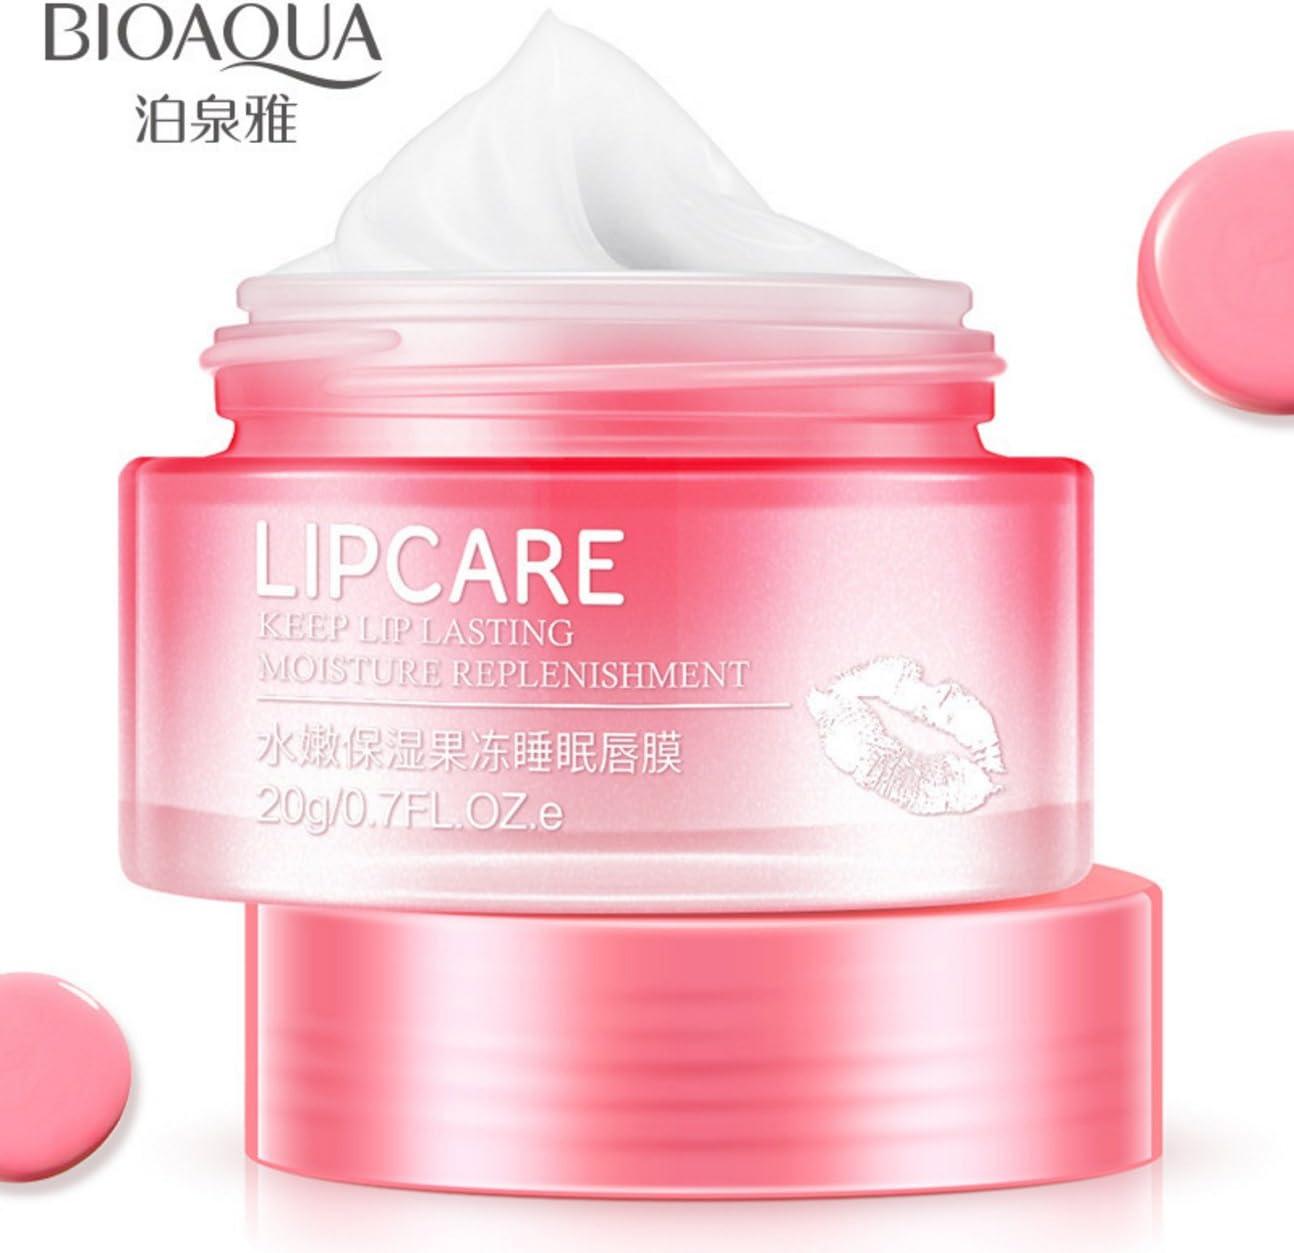 BIOAQUA Lip Lasting Collagen Replenisment Sexy Delicious Water Balance Nutrition Moisturizing Soft Beautiful Skin Vitamin E Mask-Jelly 20g